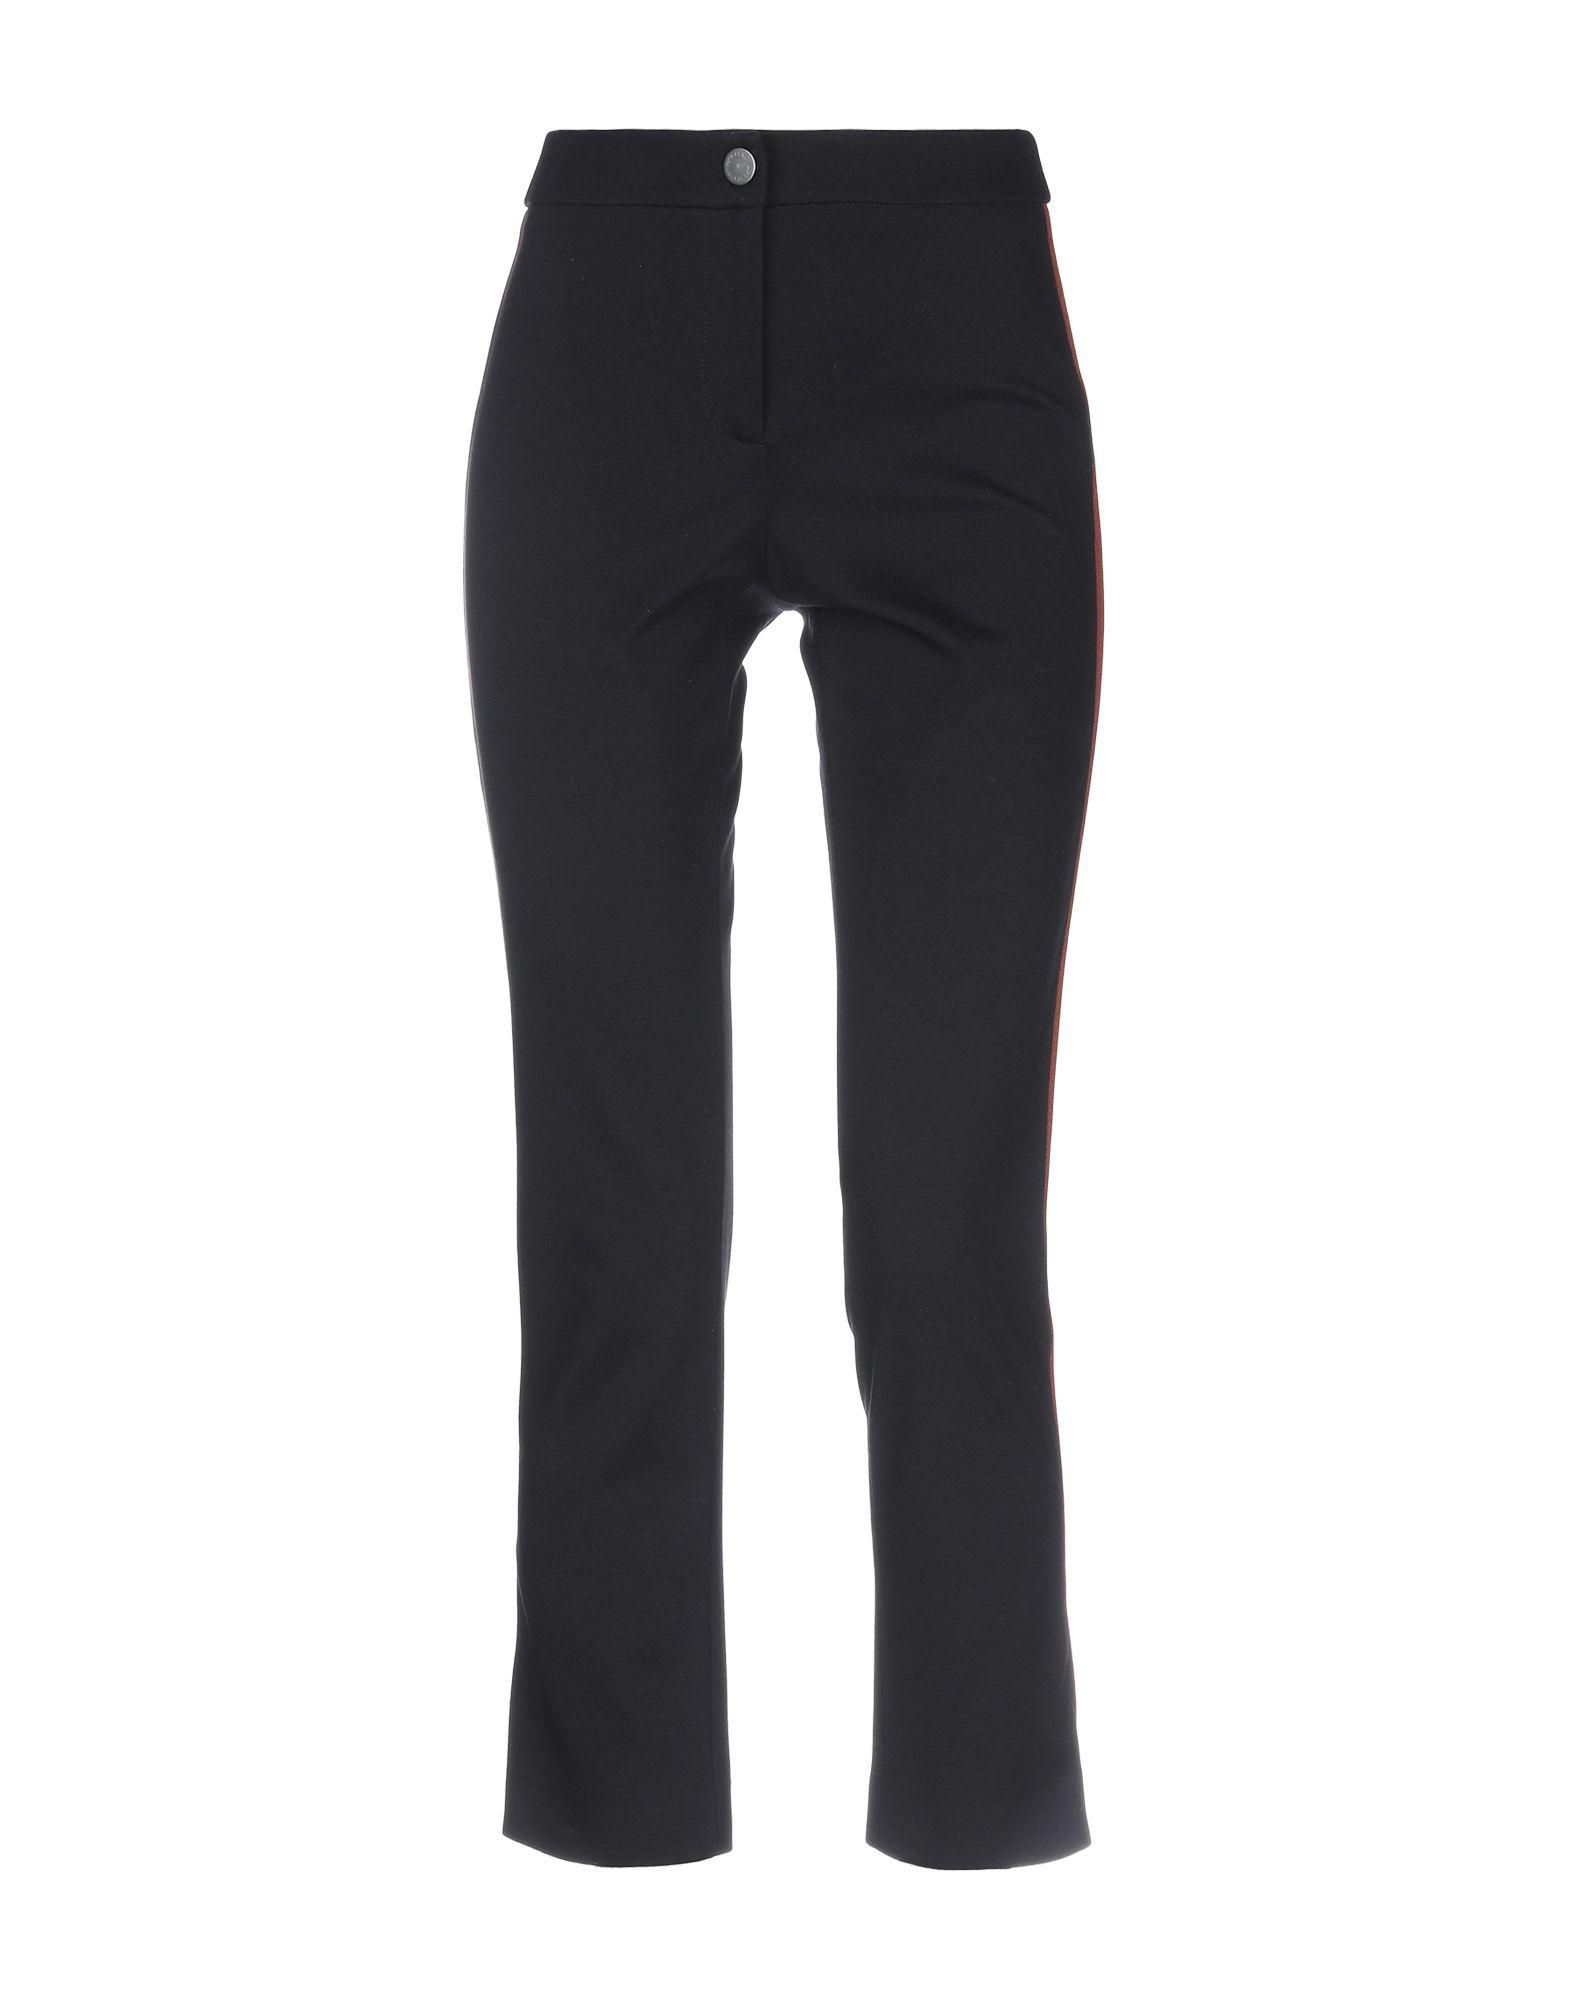 Belstaff Casual Pants In Black